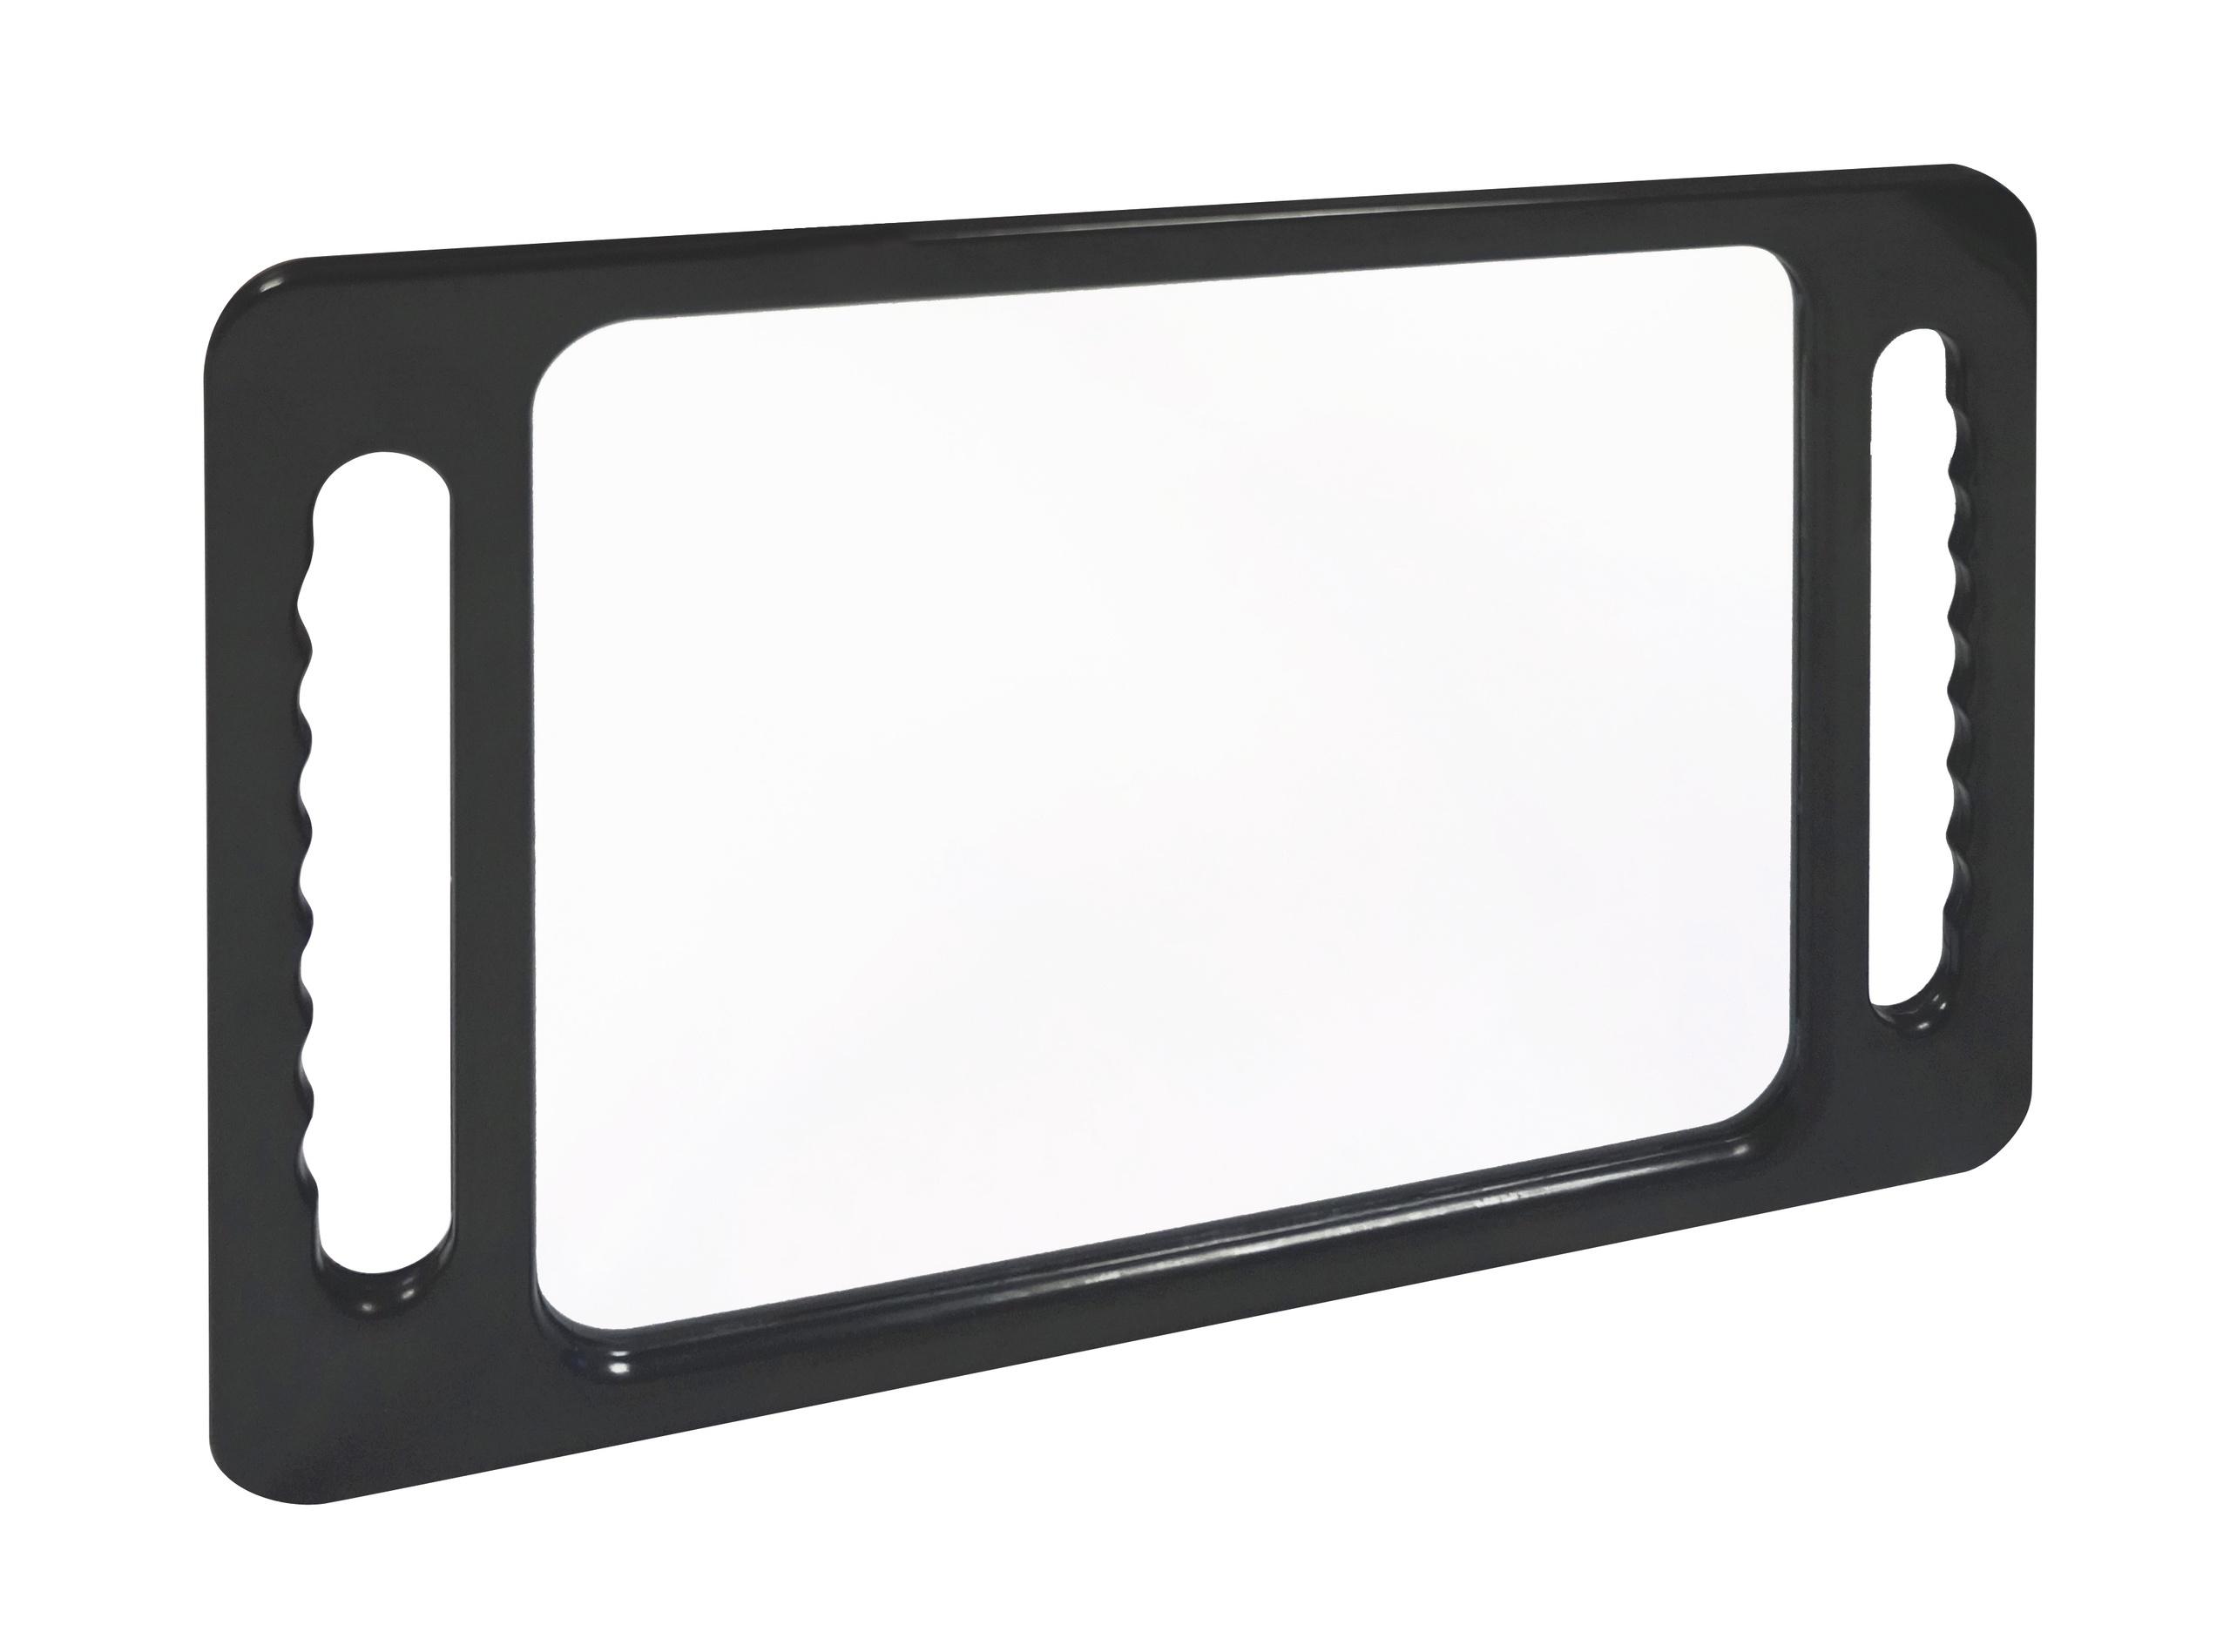 miroir de coiffure window rectangle. Black Bedroom Furniture Sets. Home Design Ideas